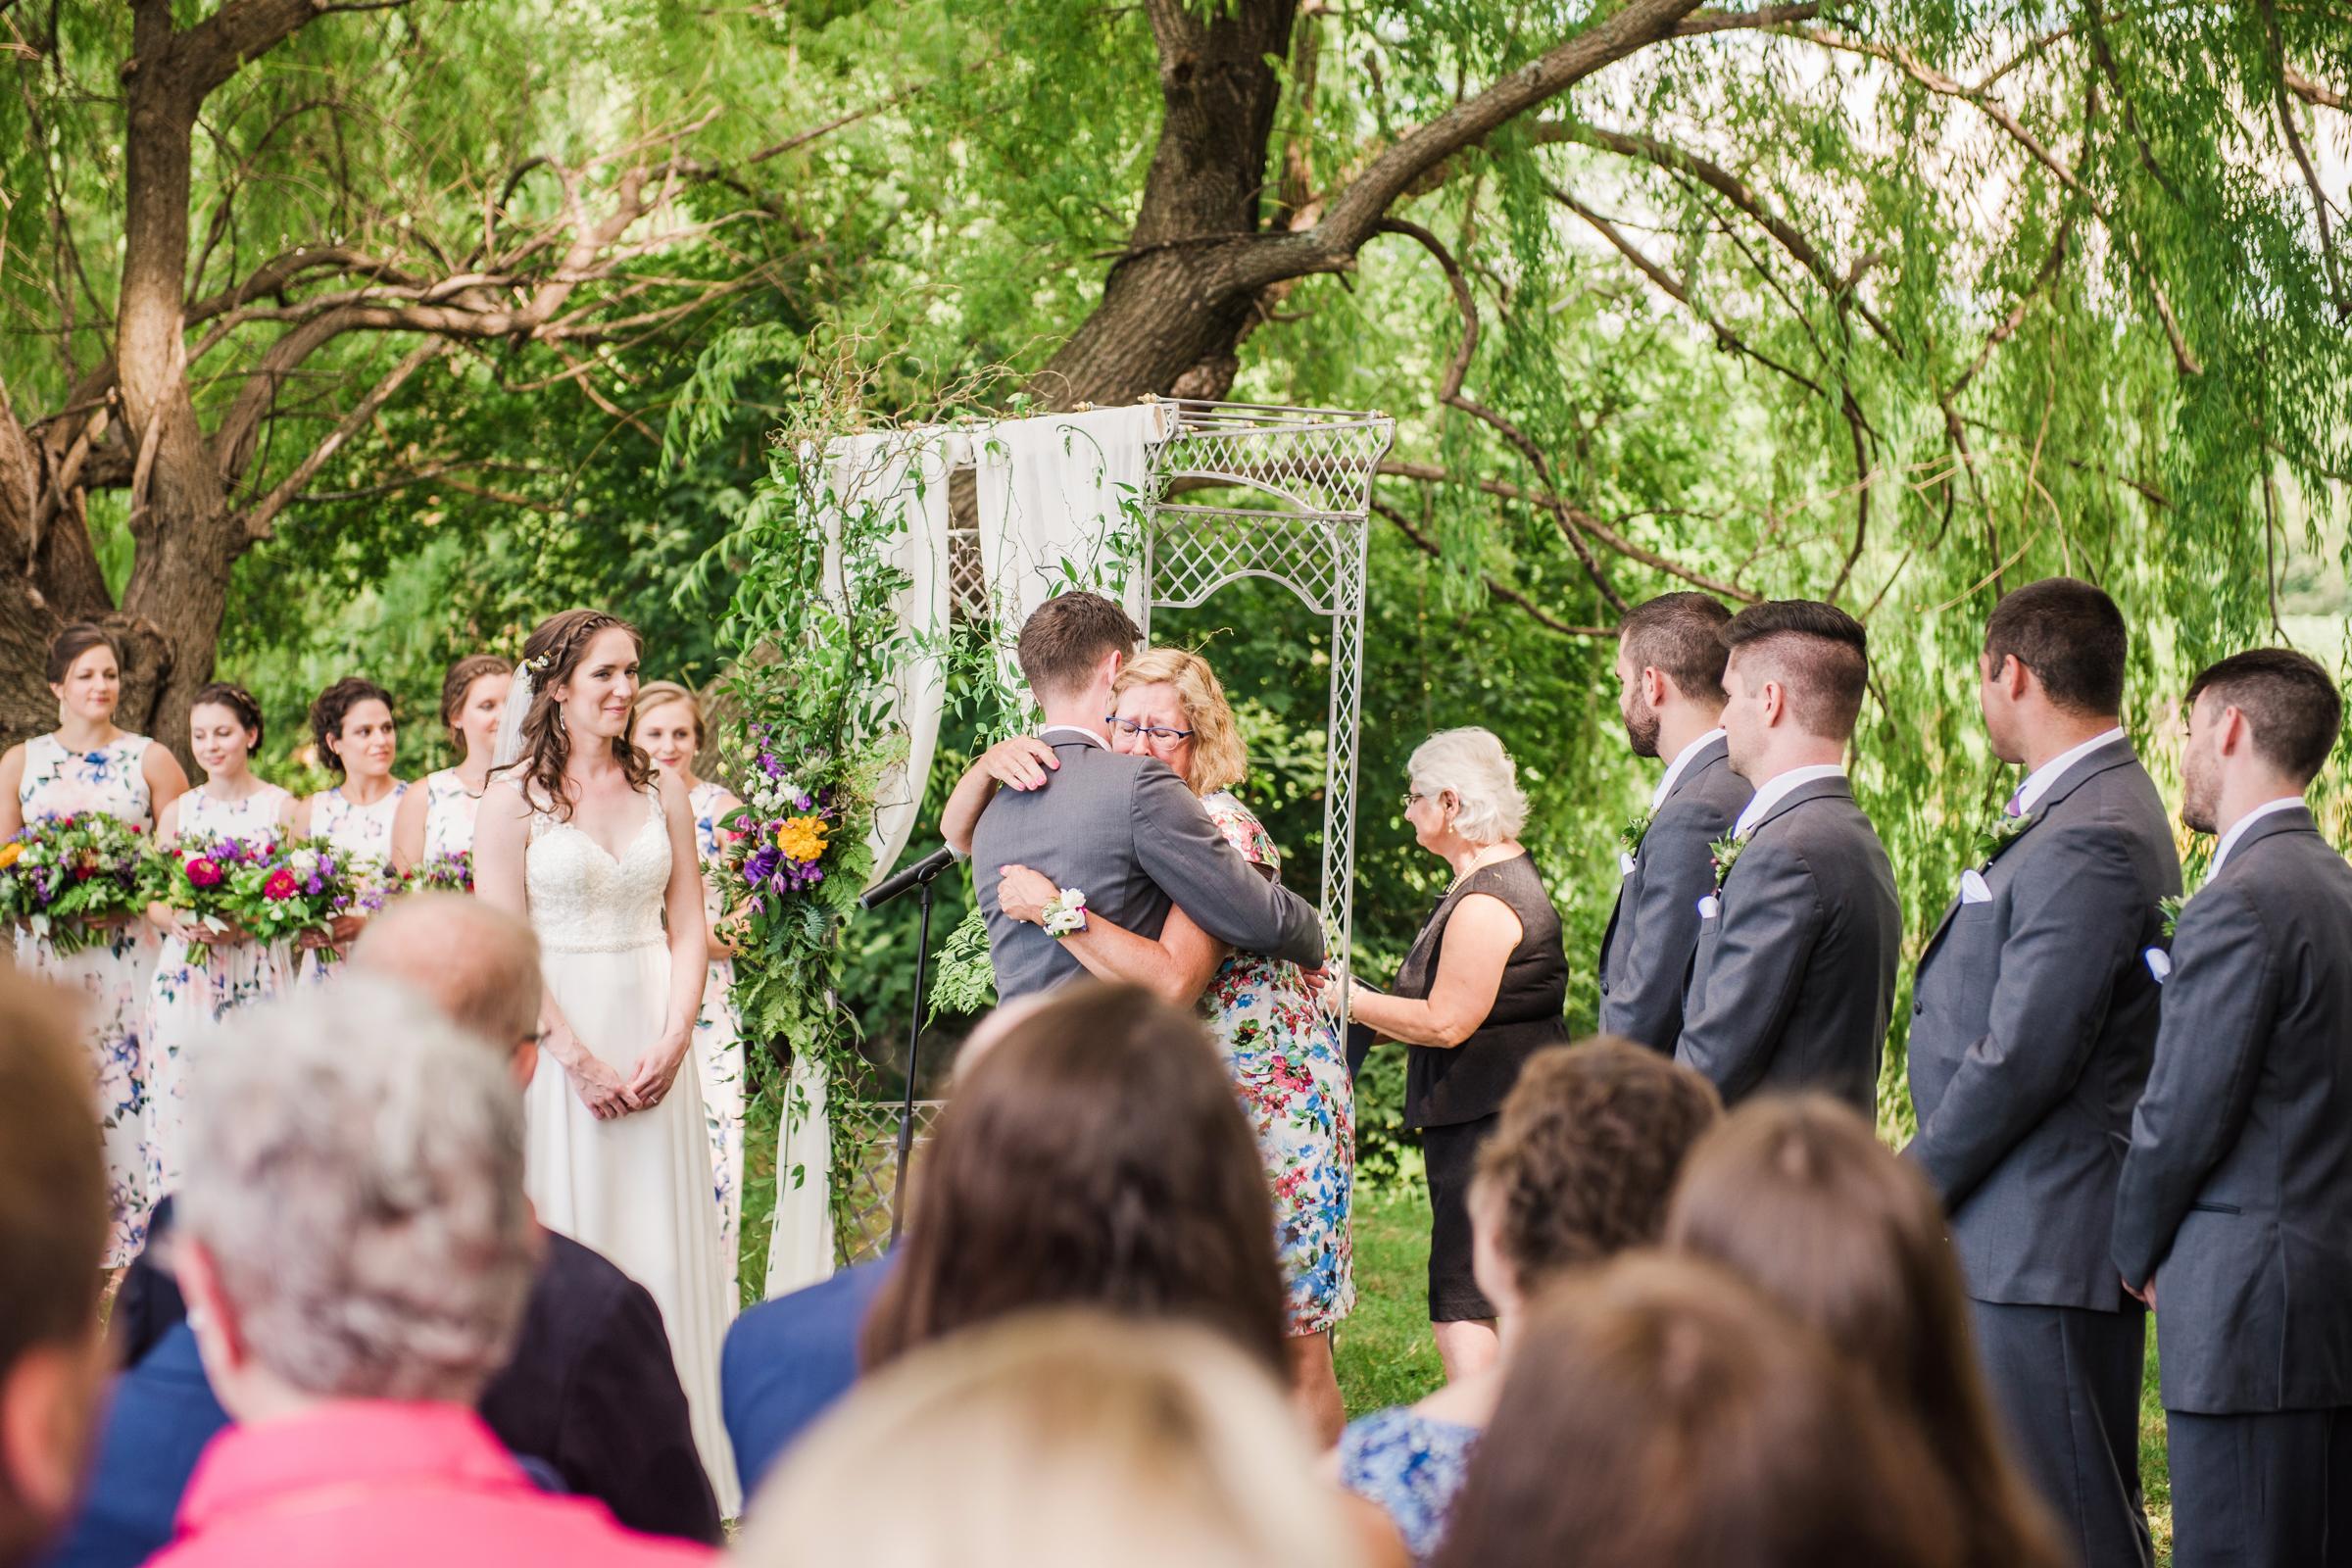 Jerris_Wadsworth_Wedding_Barn_Rochester_Wedding_JILL_STUDIO_Rochester_NY_Photographer_DSC_2622.jpg